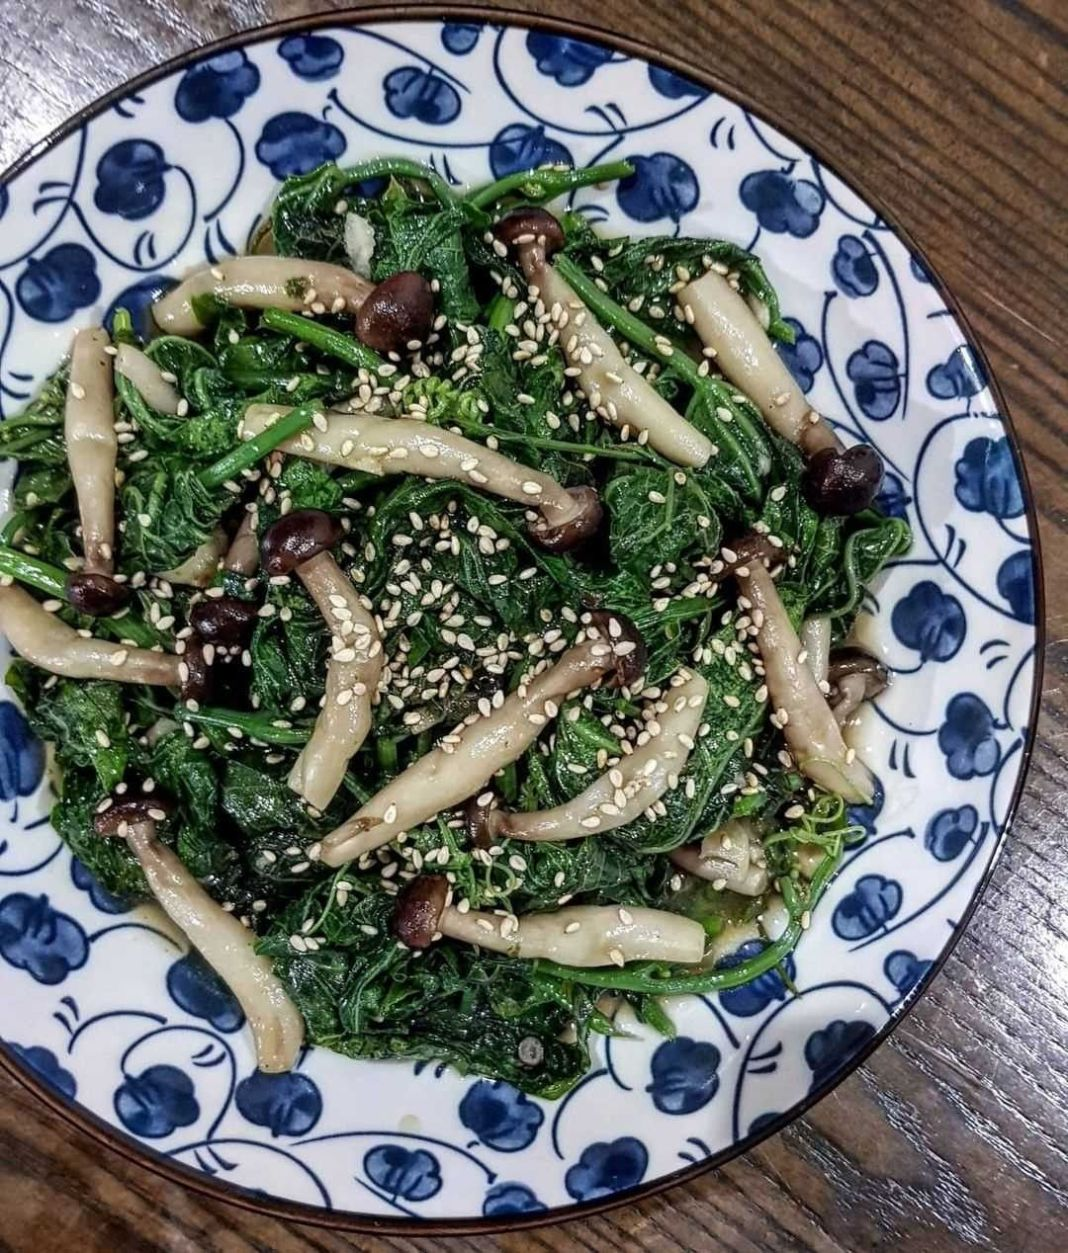 Info kuliner, Tumis Daun Pucuk Labu  Bahan : 2 ikat daun pucuk labu, petik serta cuci bersih 100 gr Jamur shime…